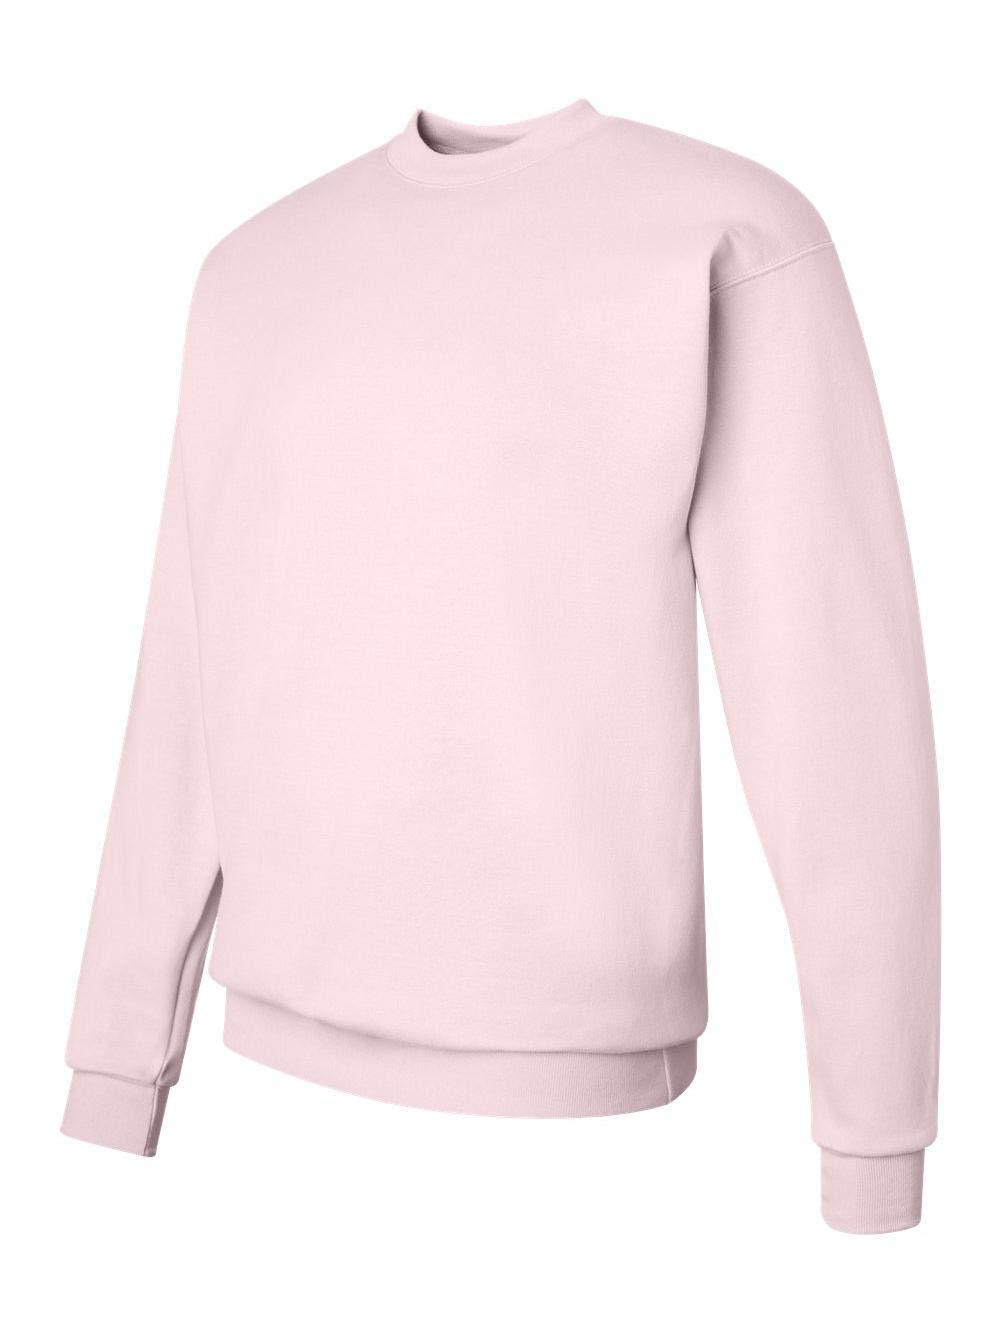 Hanes 7.8 oz COMFORTBLEND Fleece Crew Pale Pink 3XL